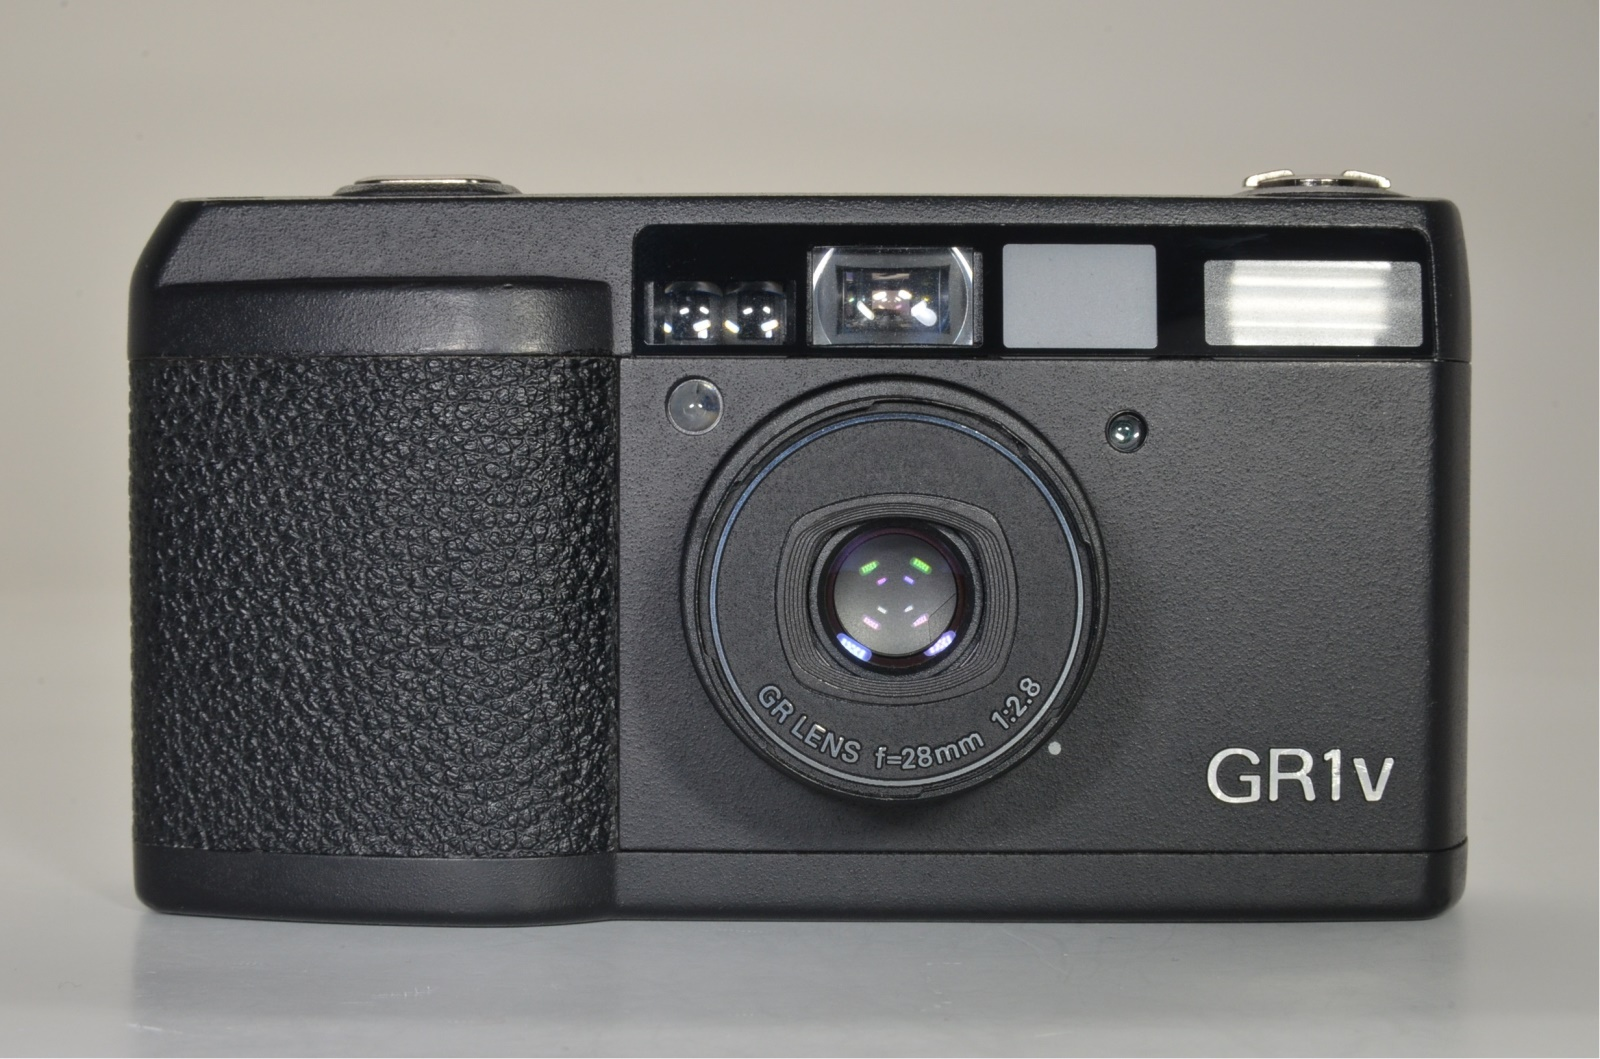 ricoh gr1v black 28mm f2.8 point & shoot film camera shooting tested